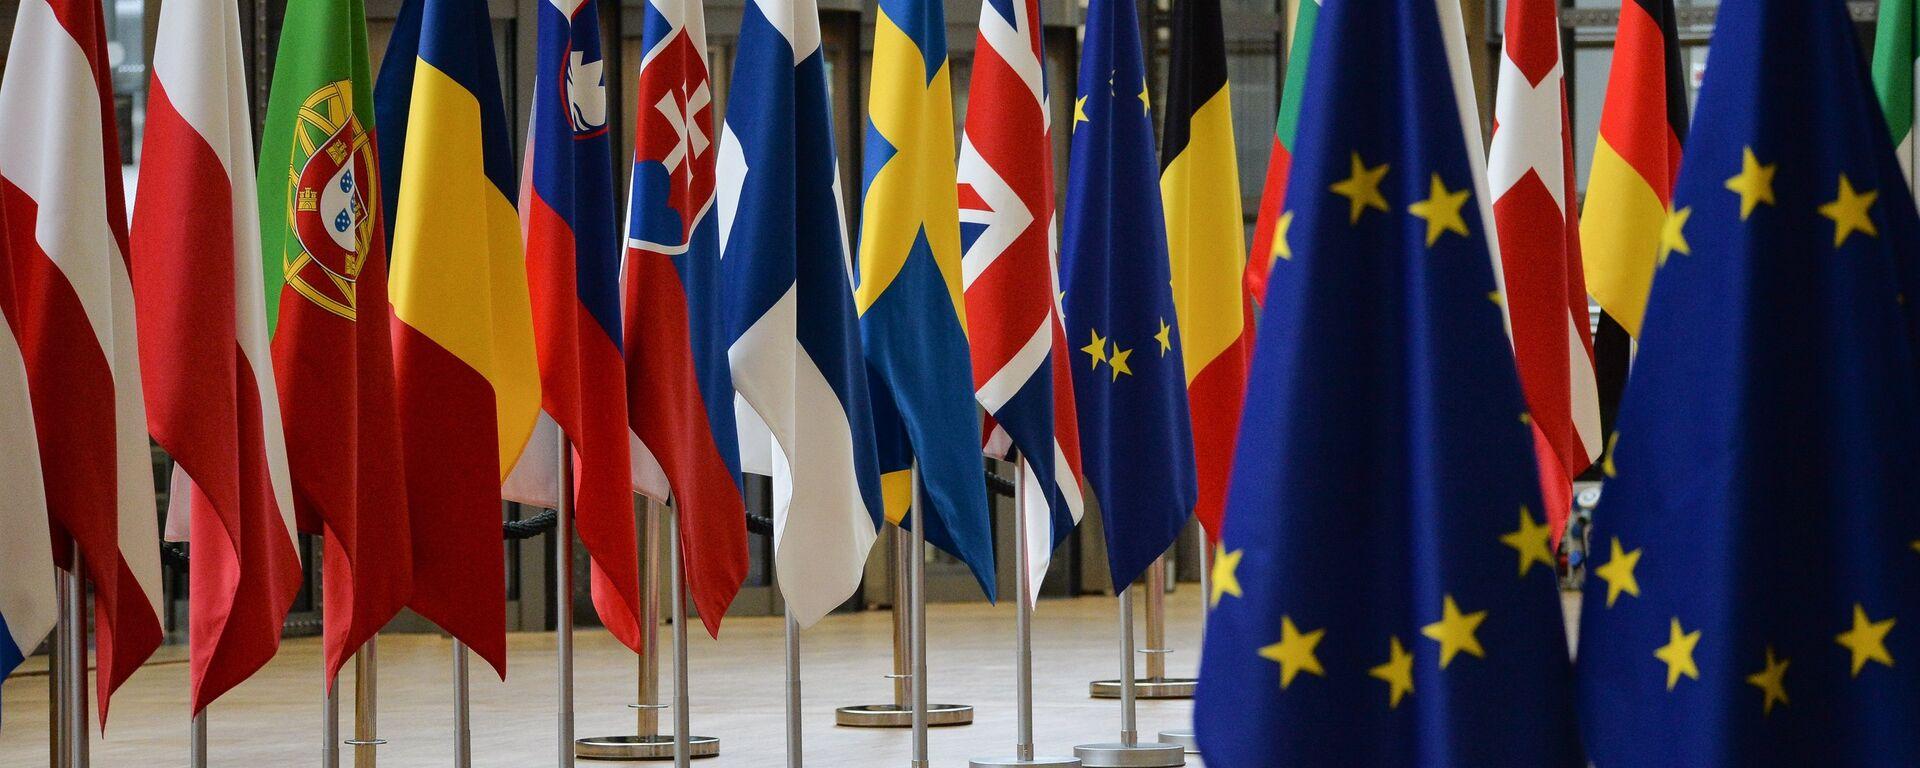 Флаги стран-участников саммита ЕС в Брюсселе - Sputnik Латвия, 1920, 25.06.2021